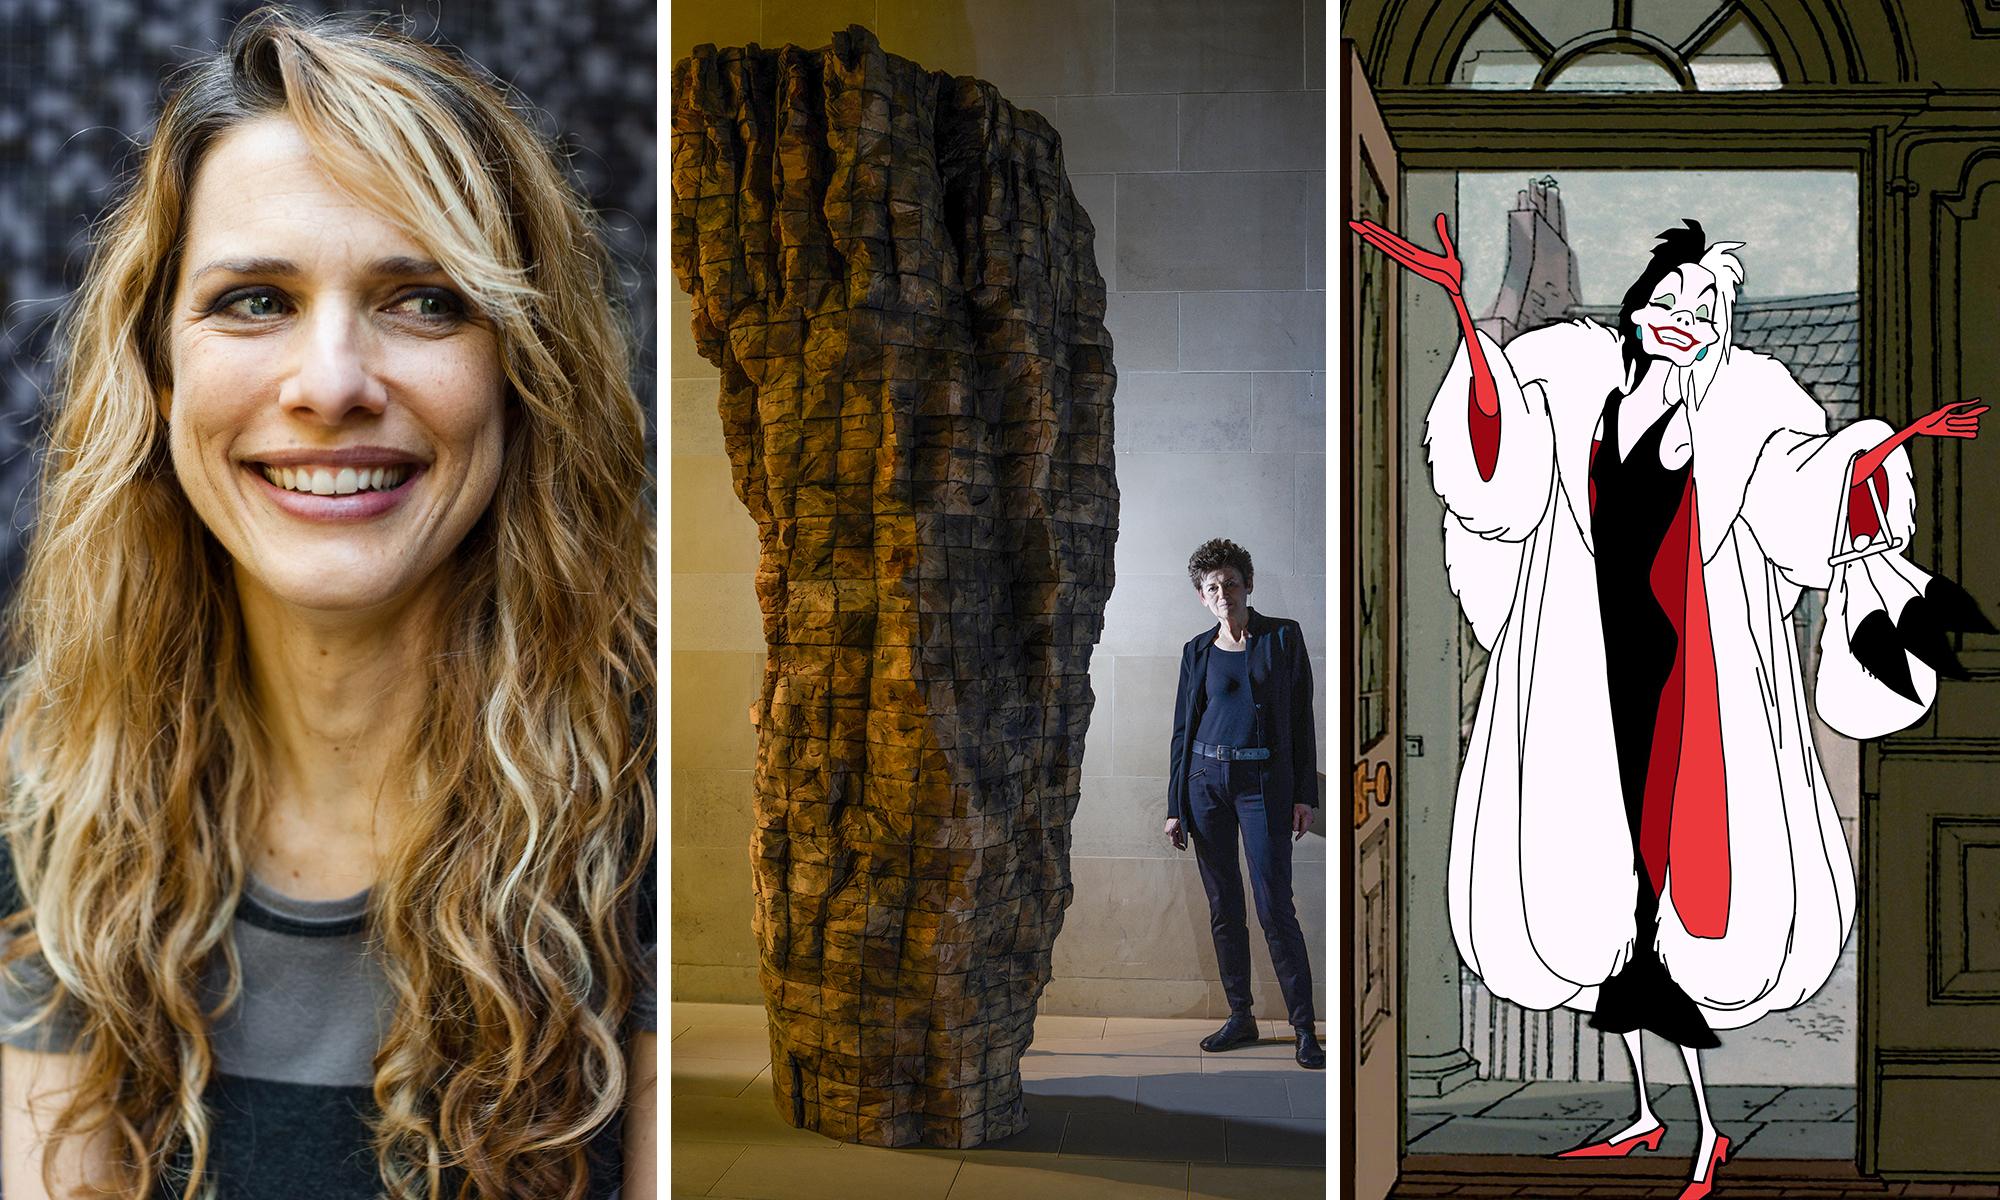 Director Lynn Shelton, artist Ursula von Rydingsvard and one of her sculptures, and the consummate villain Cruella de Vil.